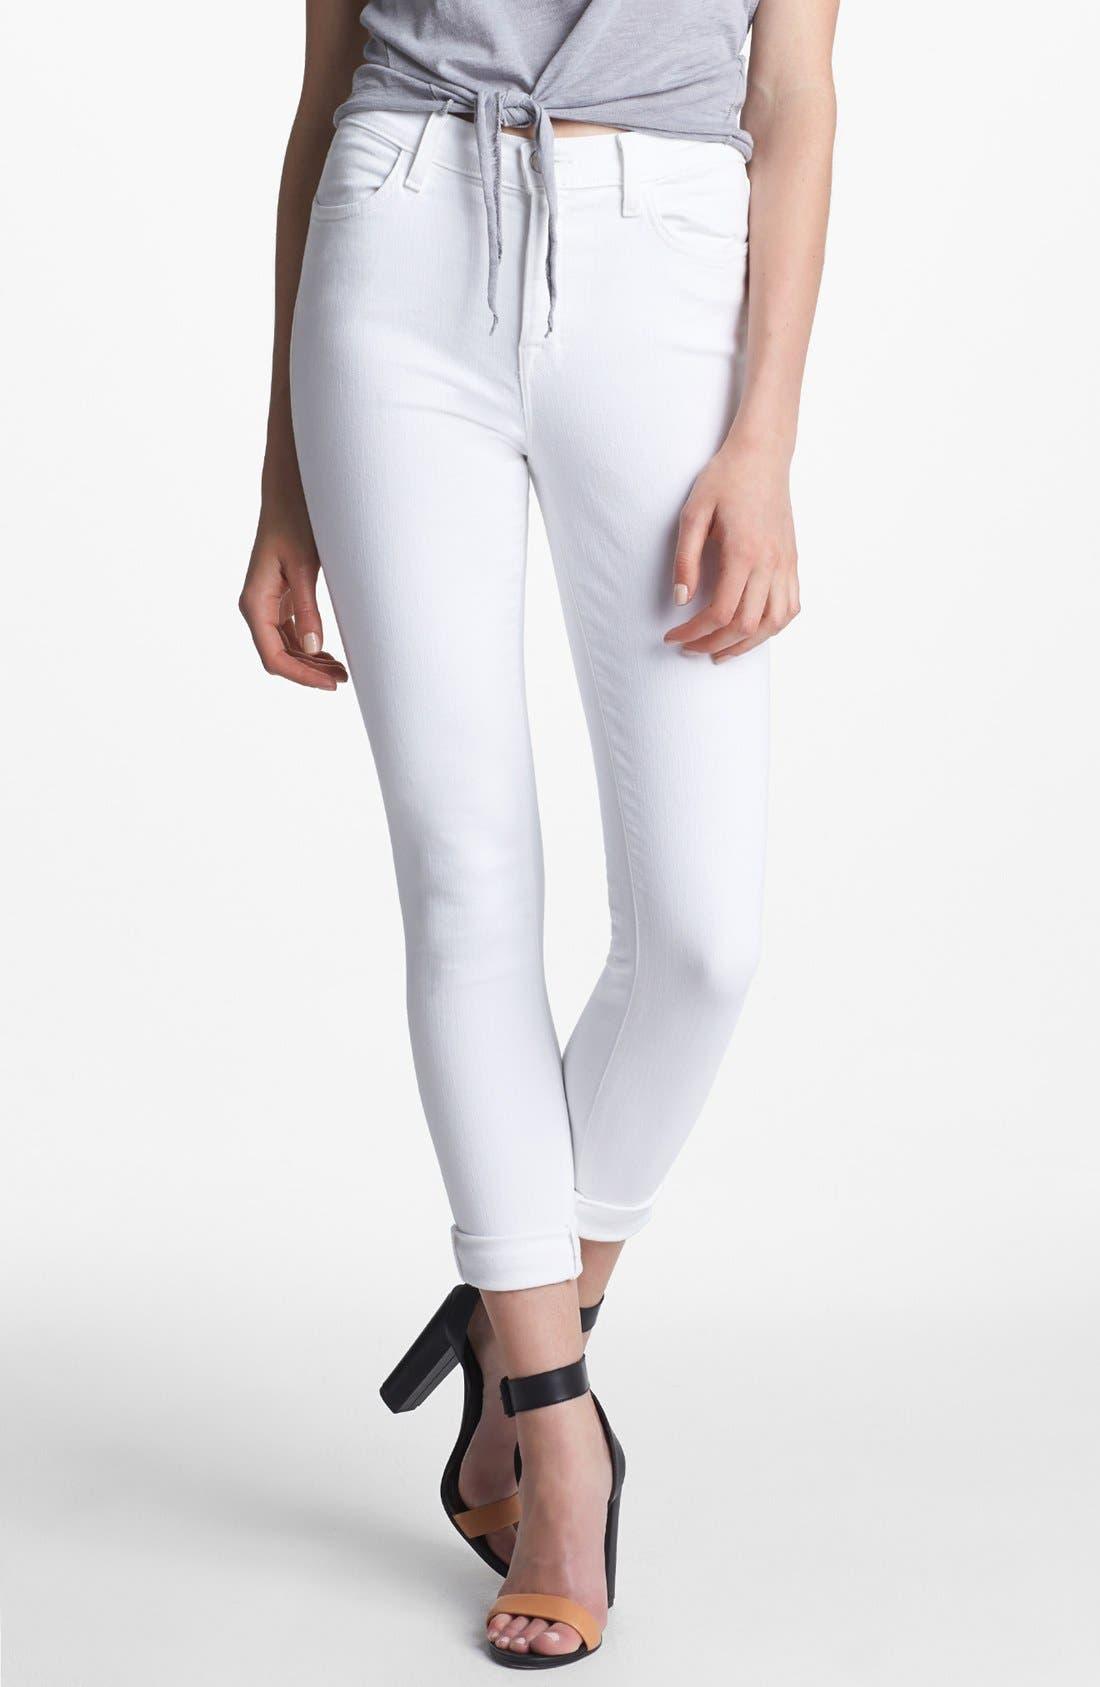 Alternate Image 1 Selected - J Brand 2311 Maria High Waist Skinny Jeans (Blanc)